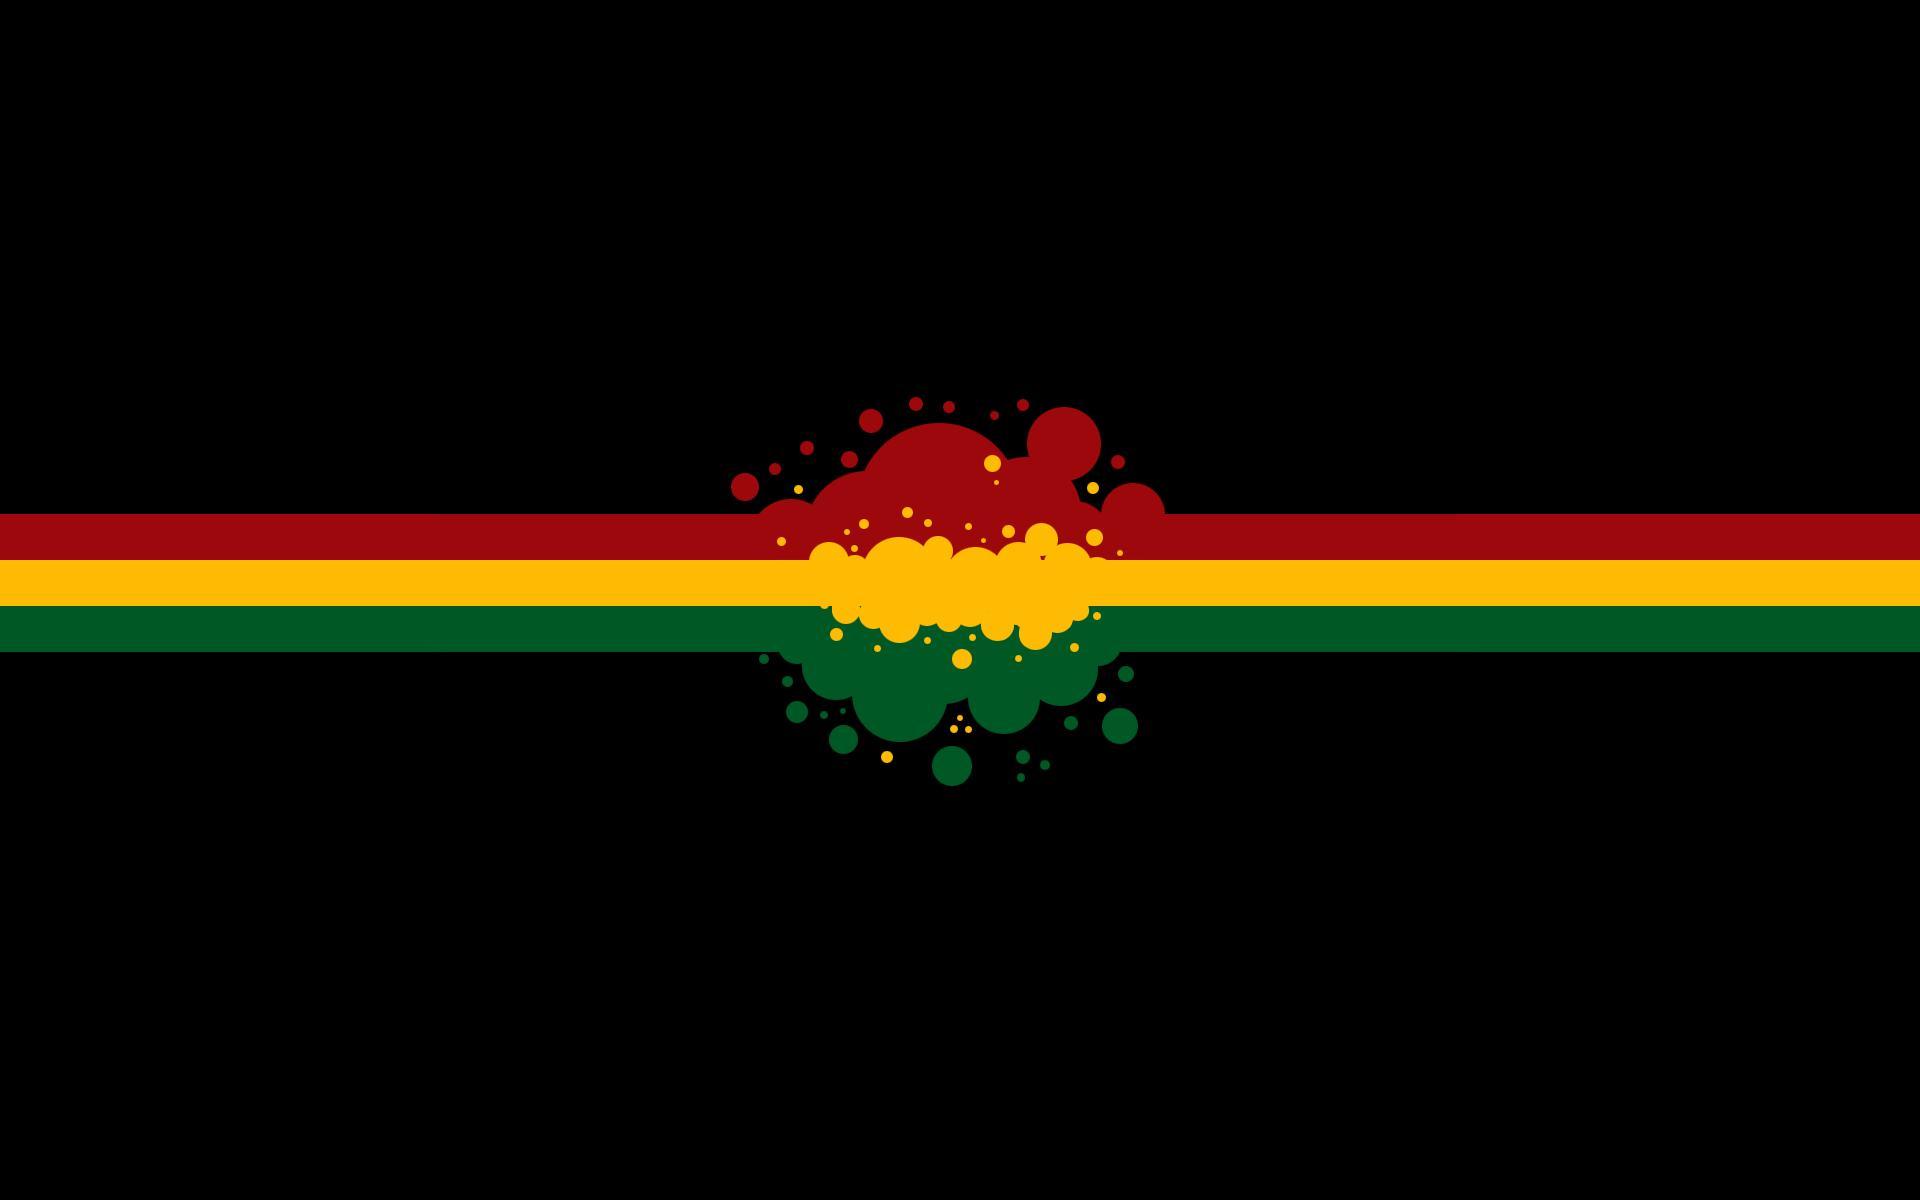 Wallpaper For Iphone X App Reggae Backgrounds Wallpaper Cave